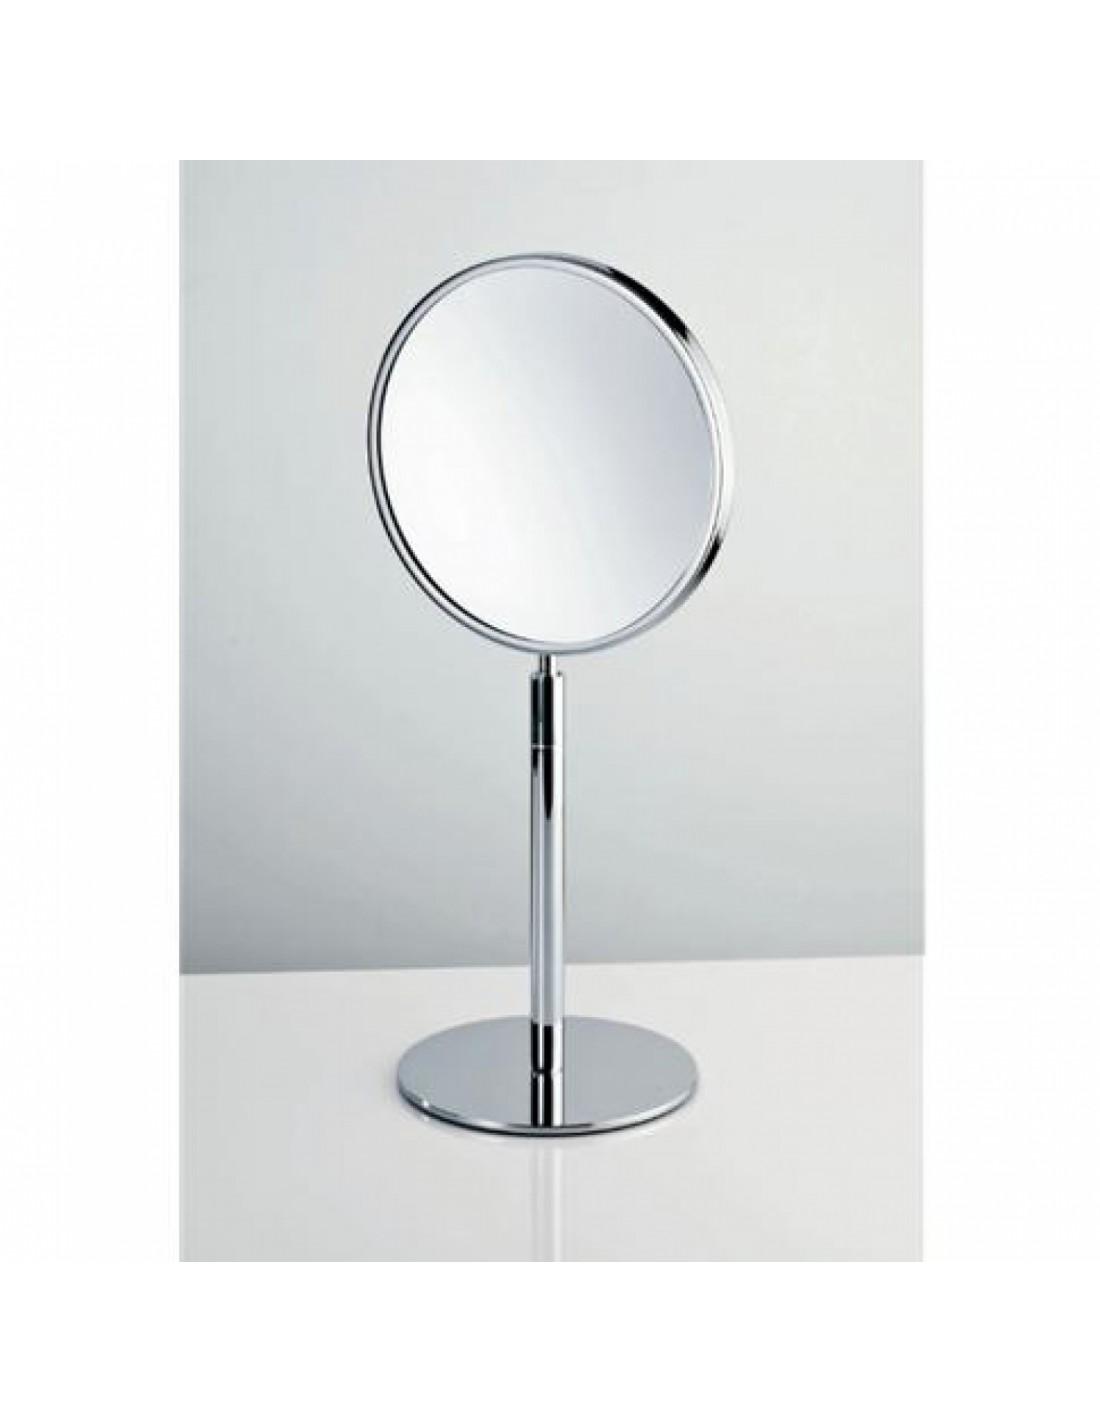 miroir grossissant sur pied decor walther. Black Bedroom Furniture Sets. Home Design Ideas